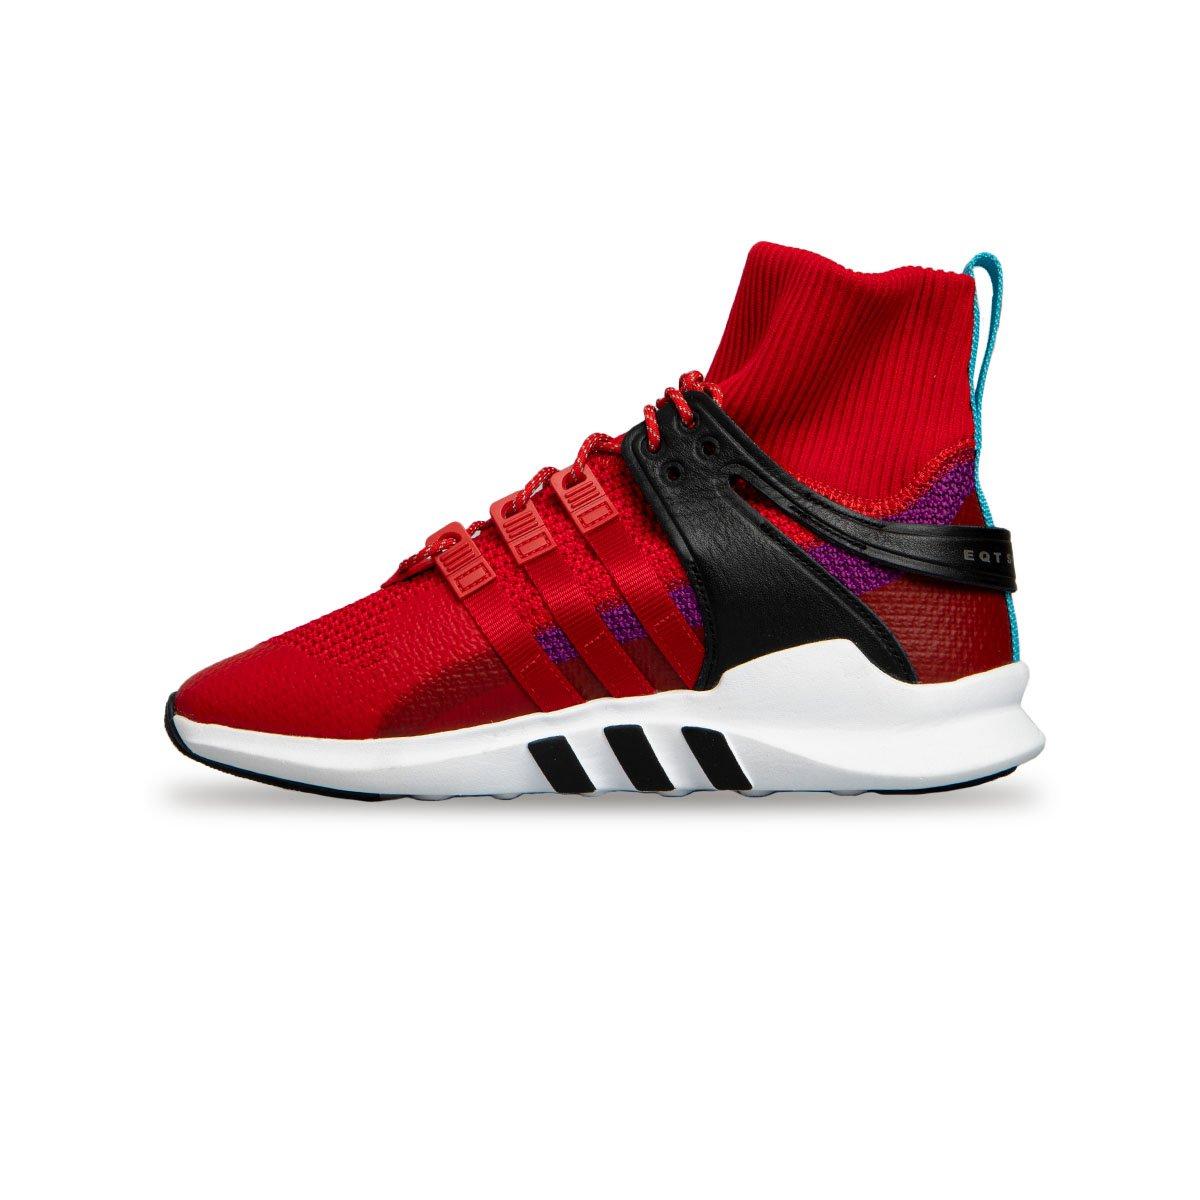 66a32e6f85a ... Adidas Originals EQT Bask ADV core black  ftwr white  hi-res red ...